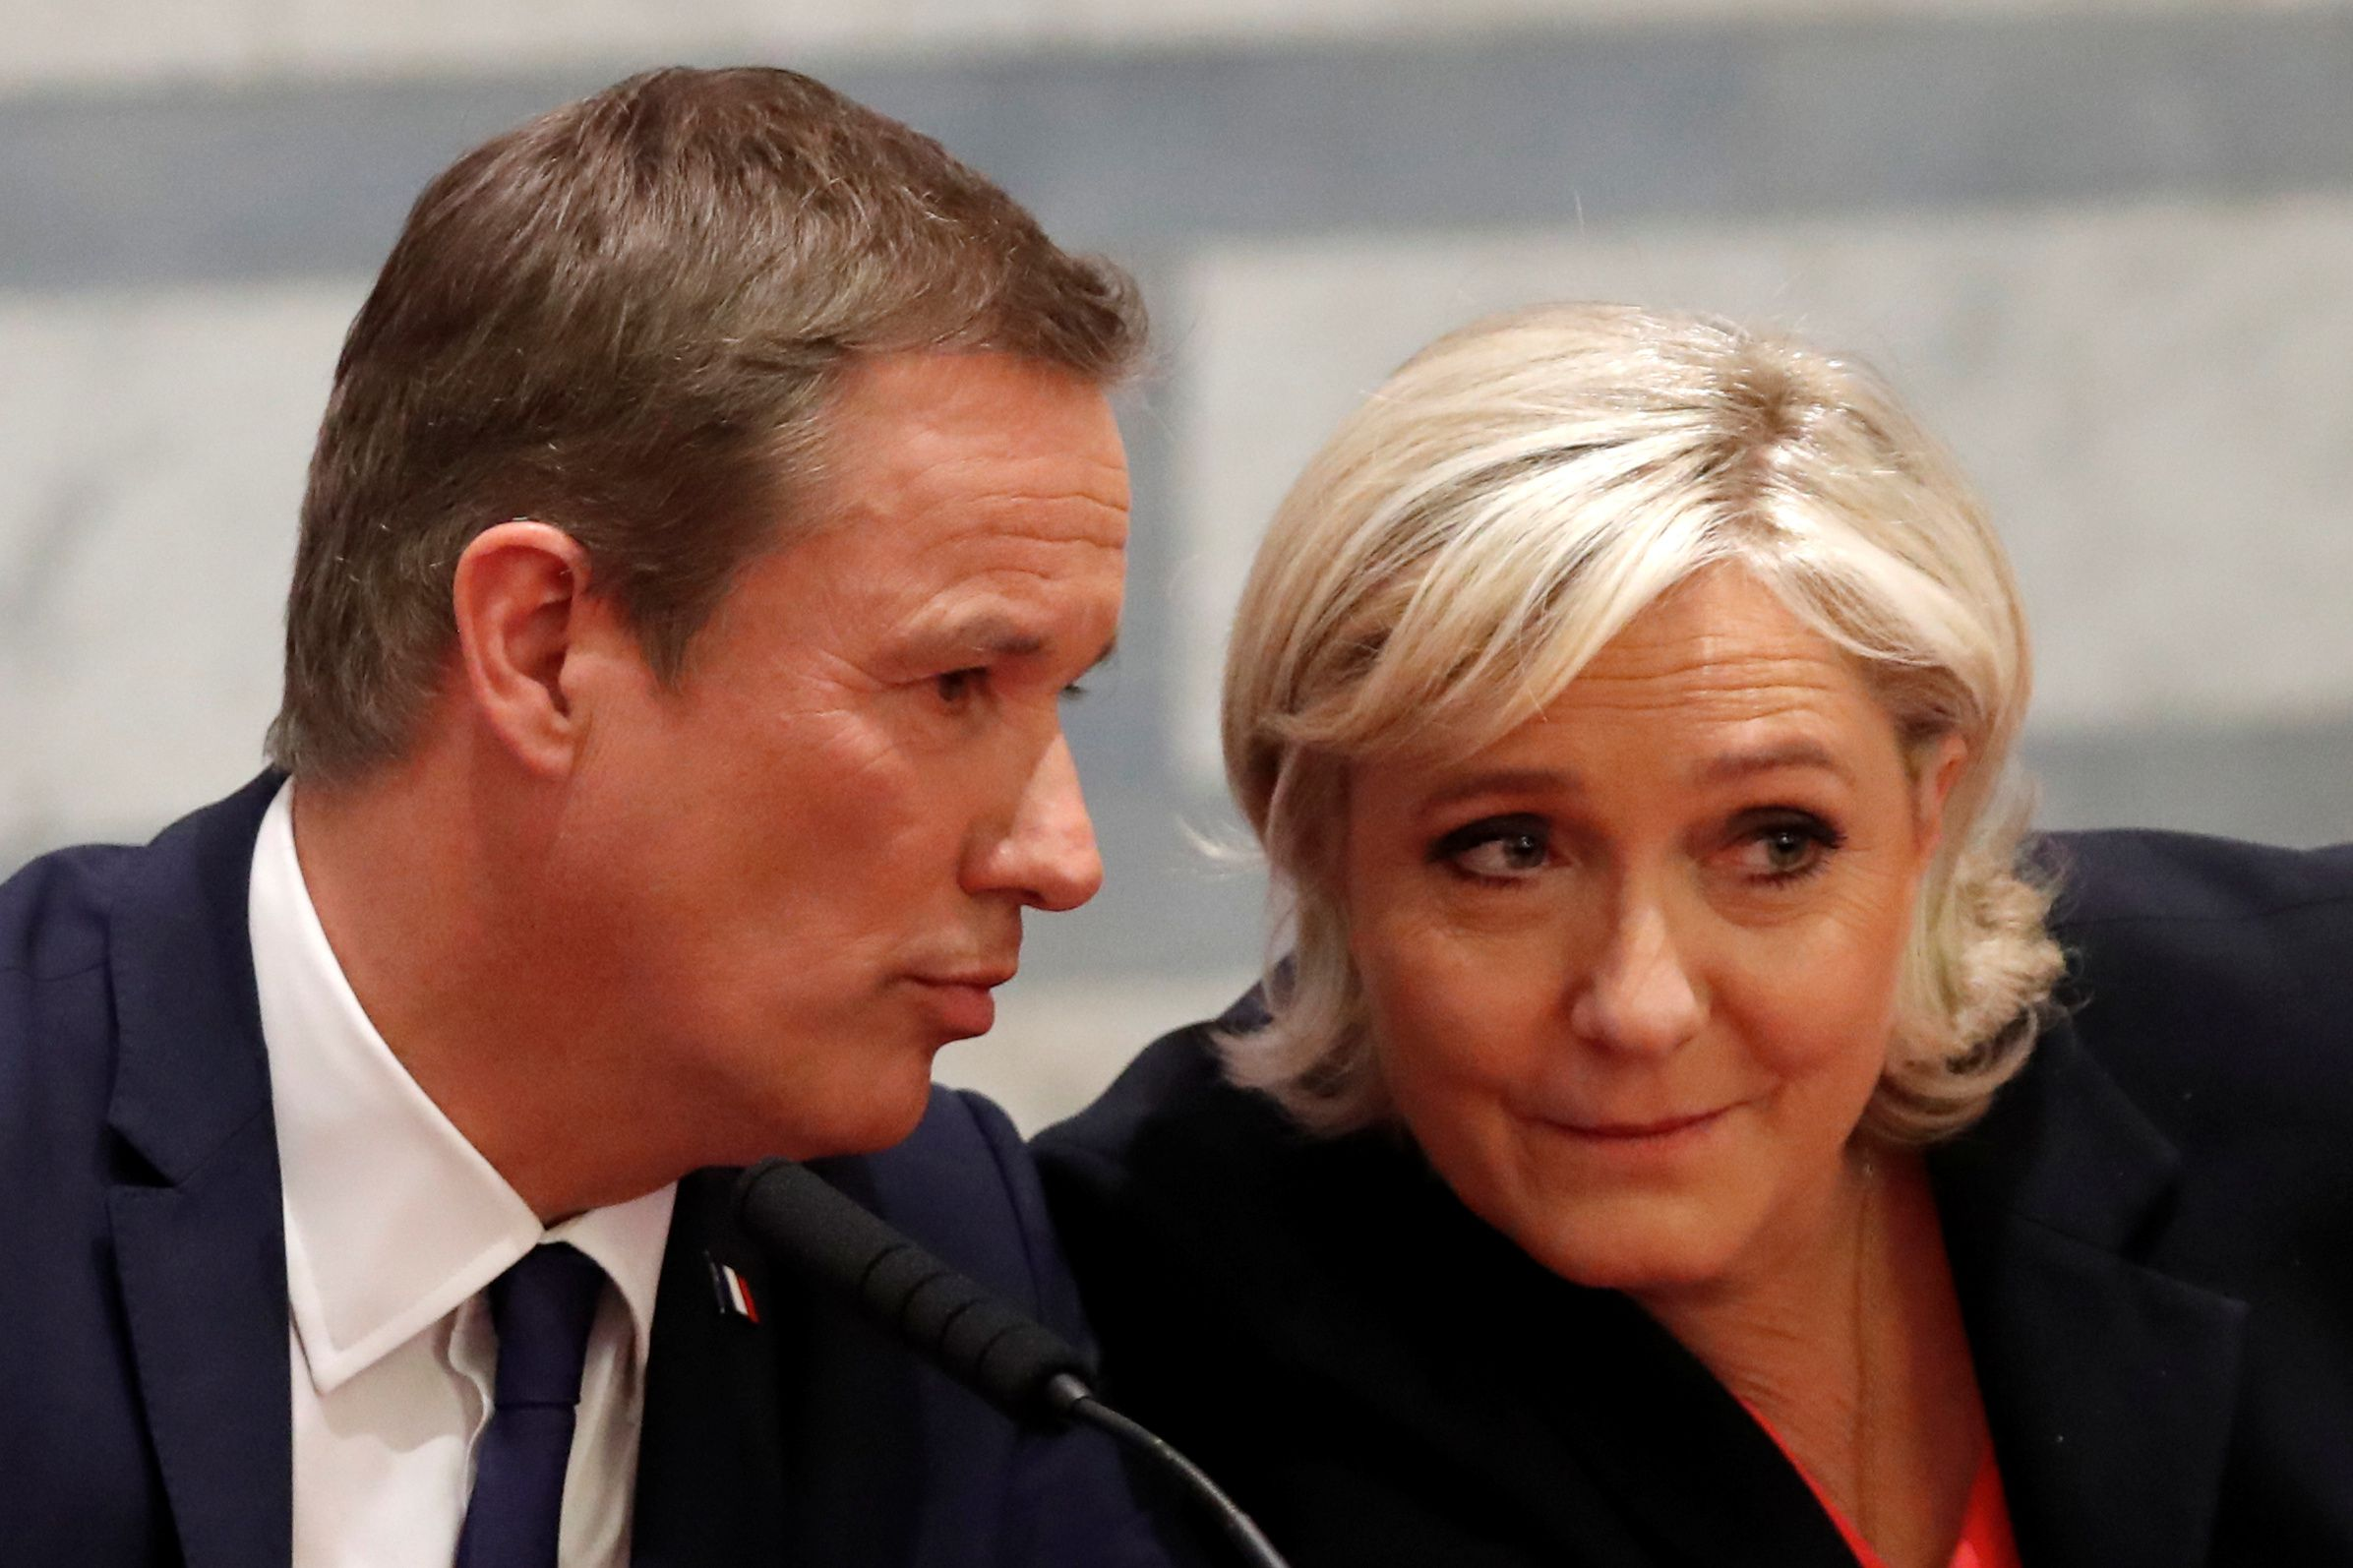 Dupont Aignan and Le Pen